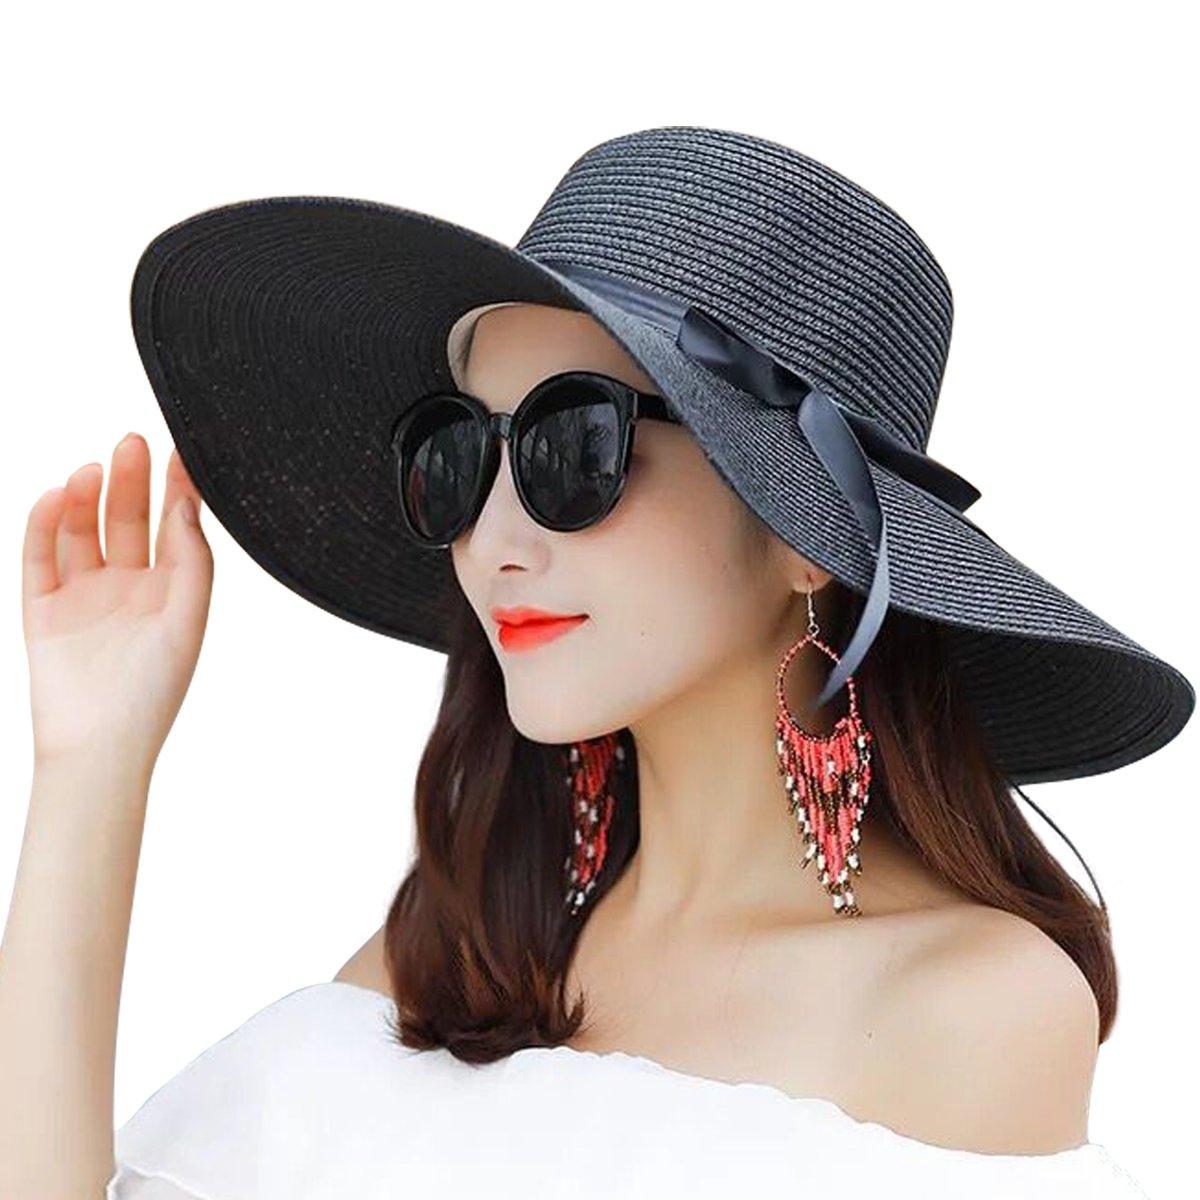 Lanzom Women Summer Big Brim Beach Hat Floppy Foldable Bowknot Straw Sun Hat (Black)